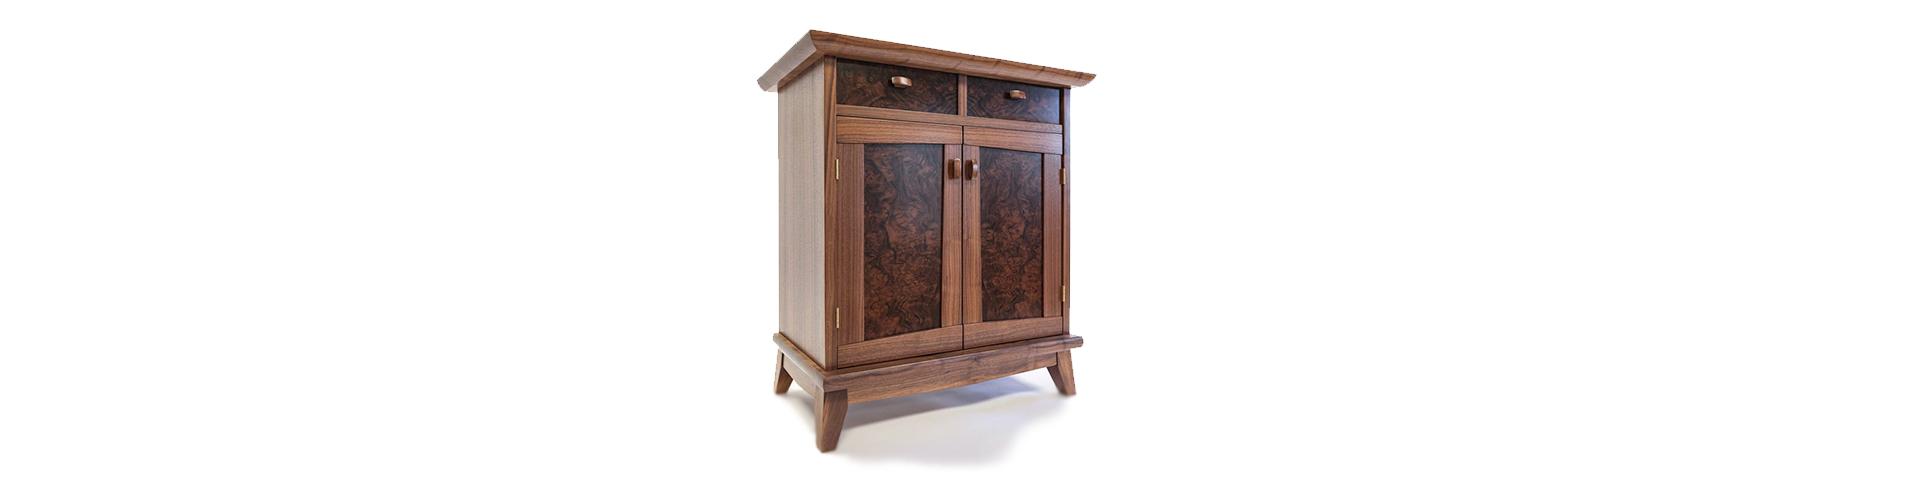 walnut burl cabinet background custom made fine wood furniture